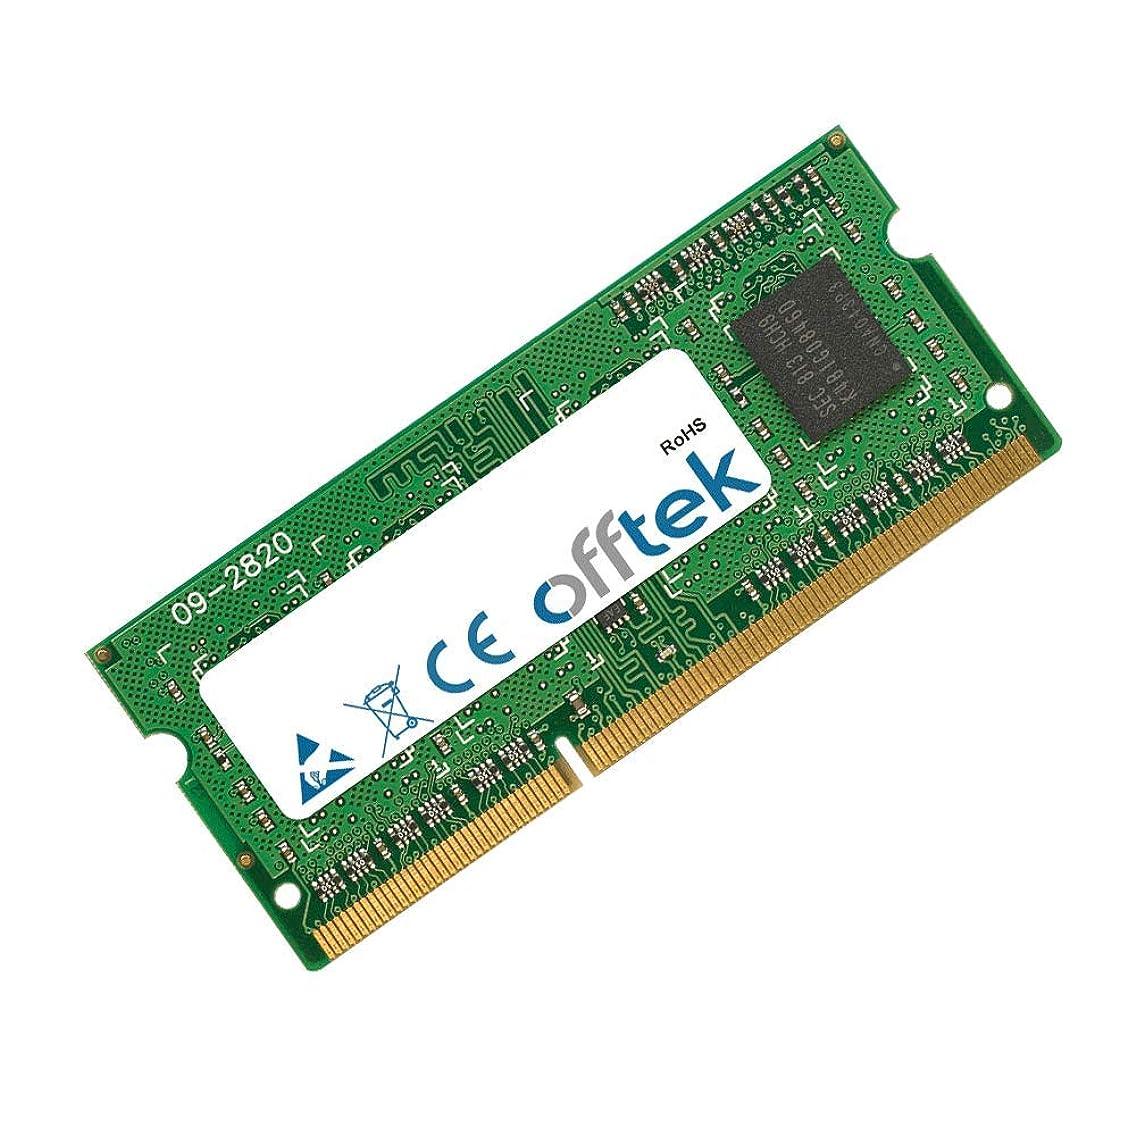 8GB RAM Memory for Acer Aspire Z3-605-UR21 (DDR3-12800) - Desktop Memory Upgrade from OFFTEK